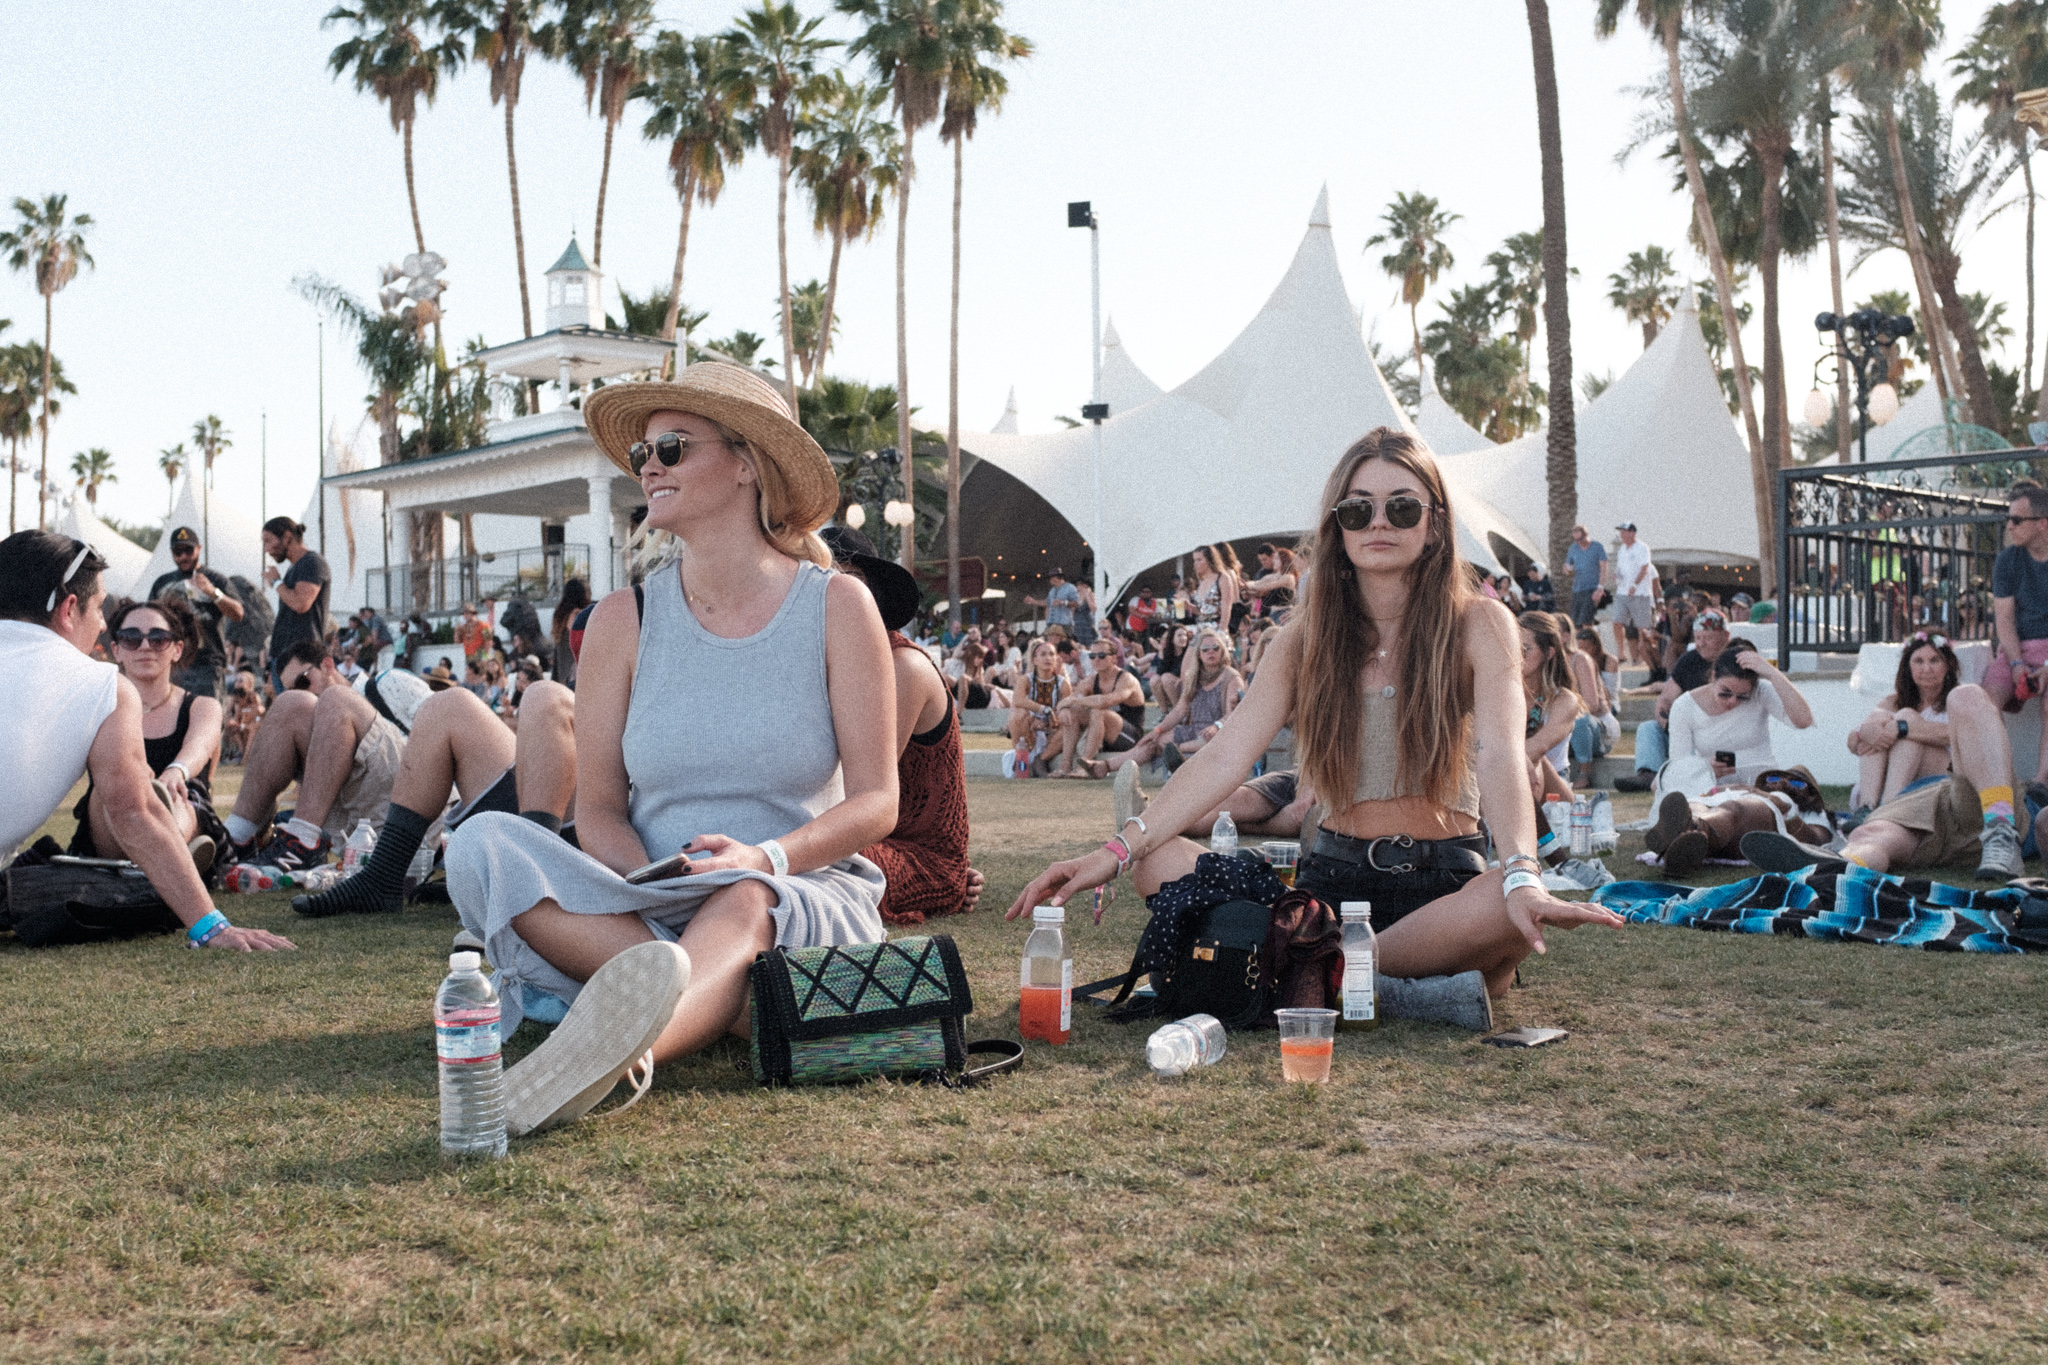 170423 Coachella 17 w2 1942.jpg